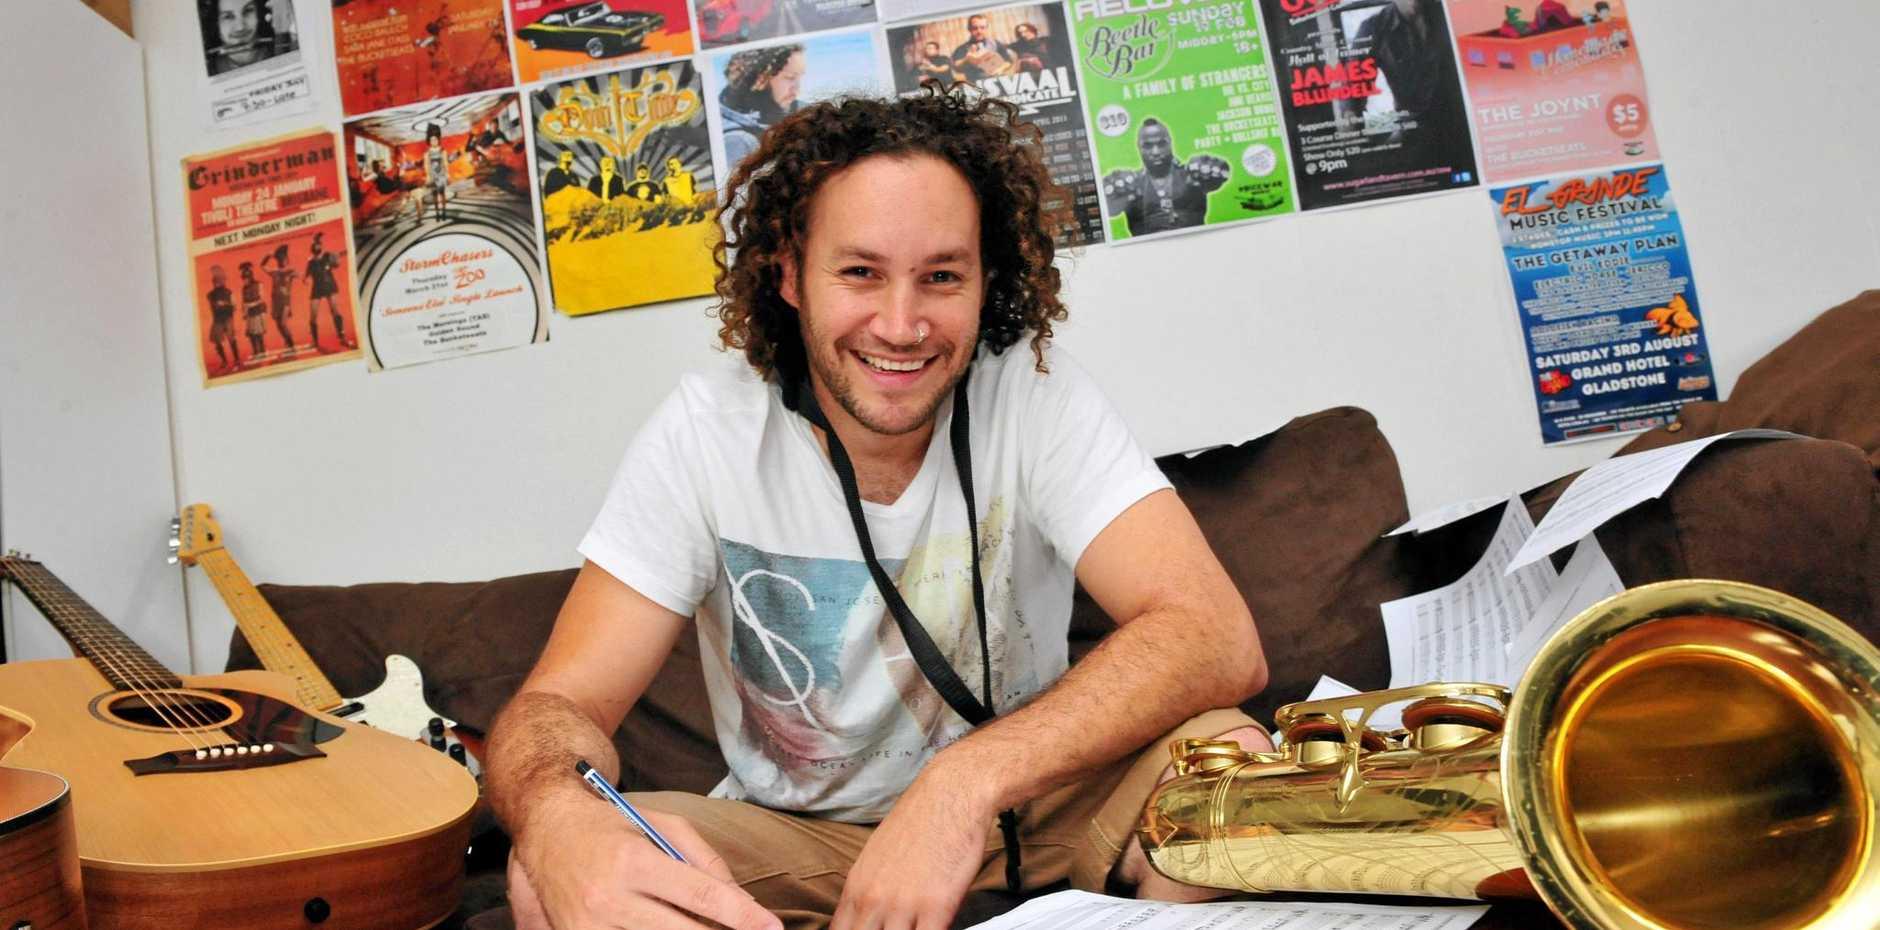 Bundaberg musician Matthew Barker.